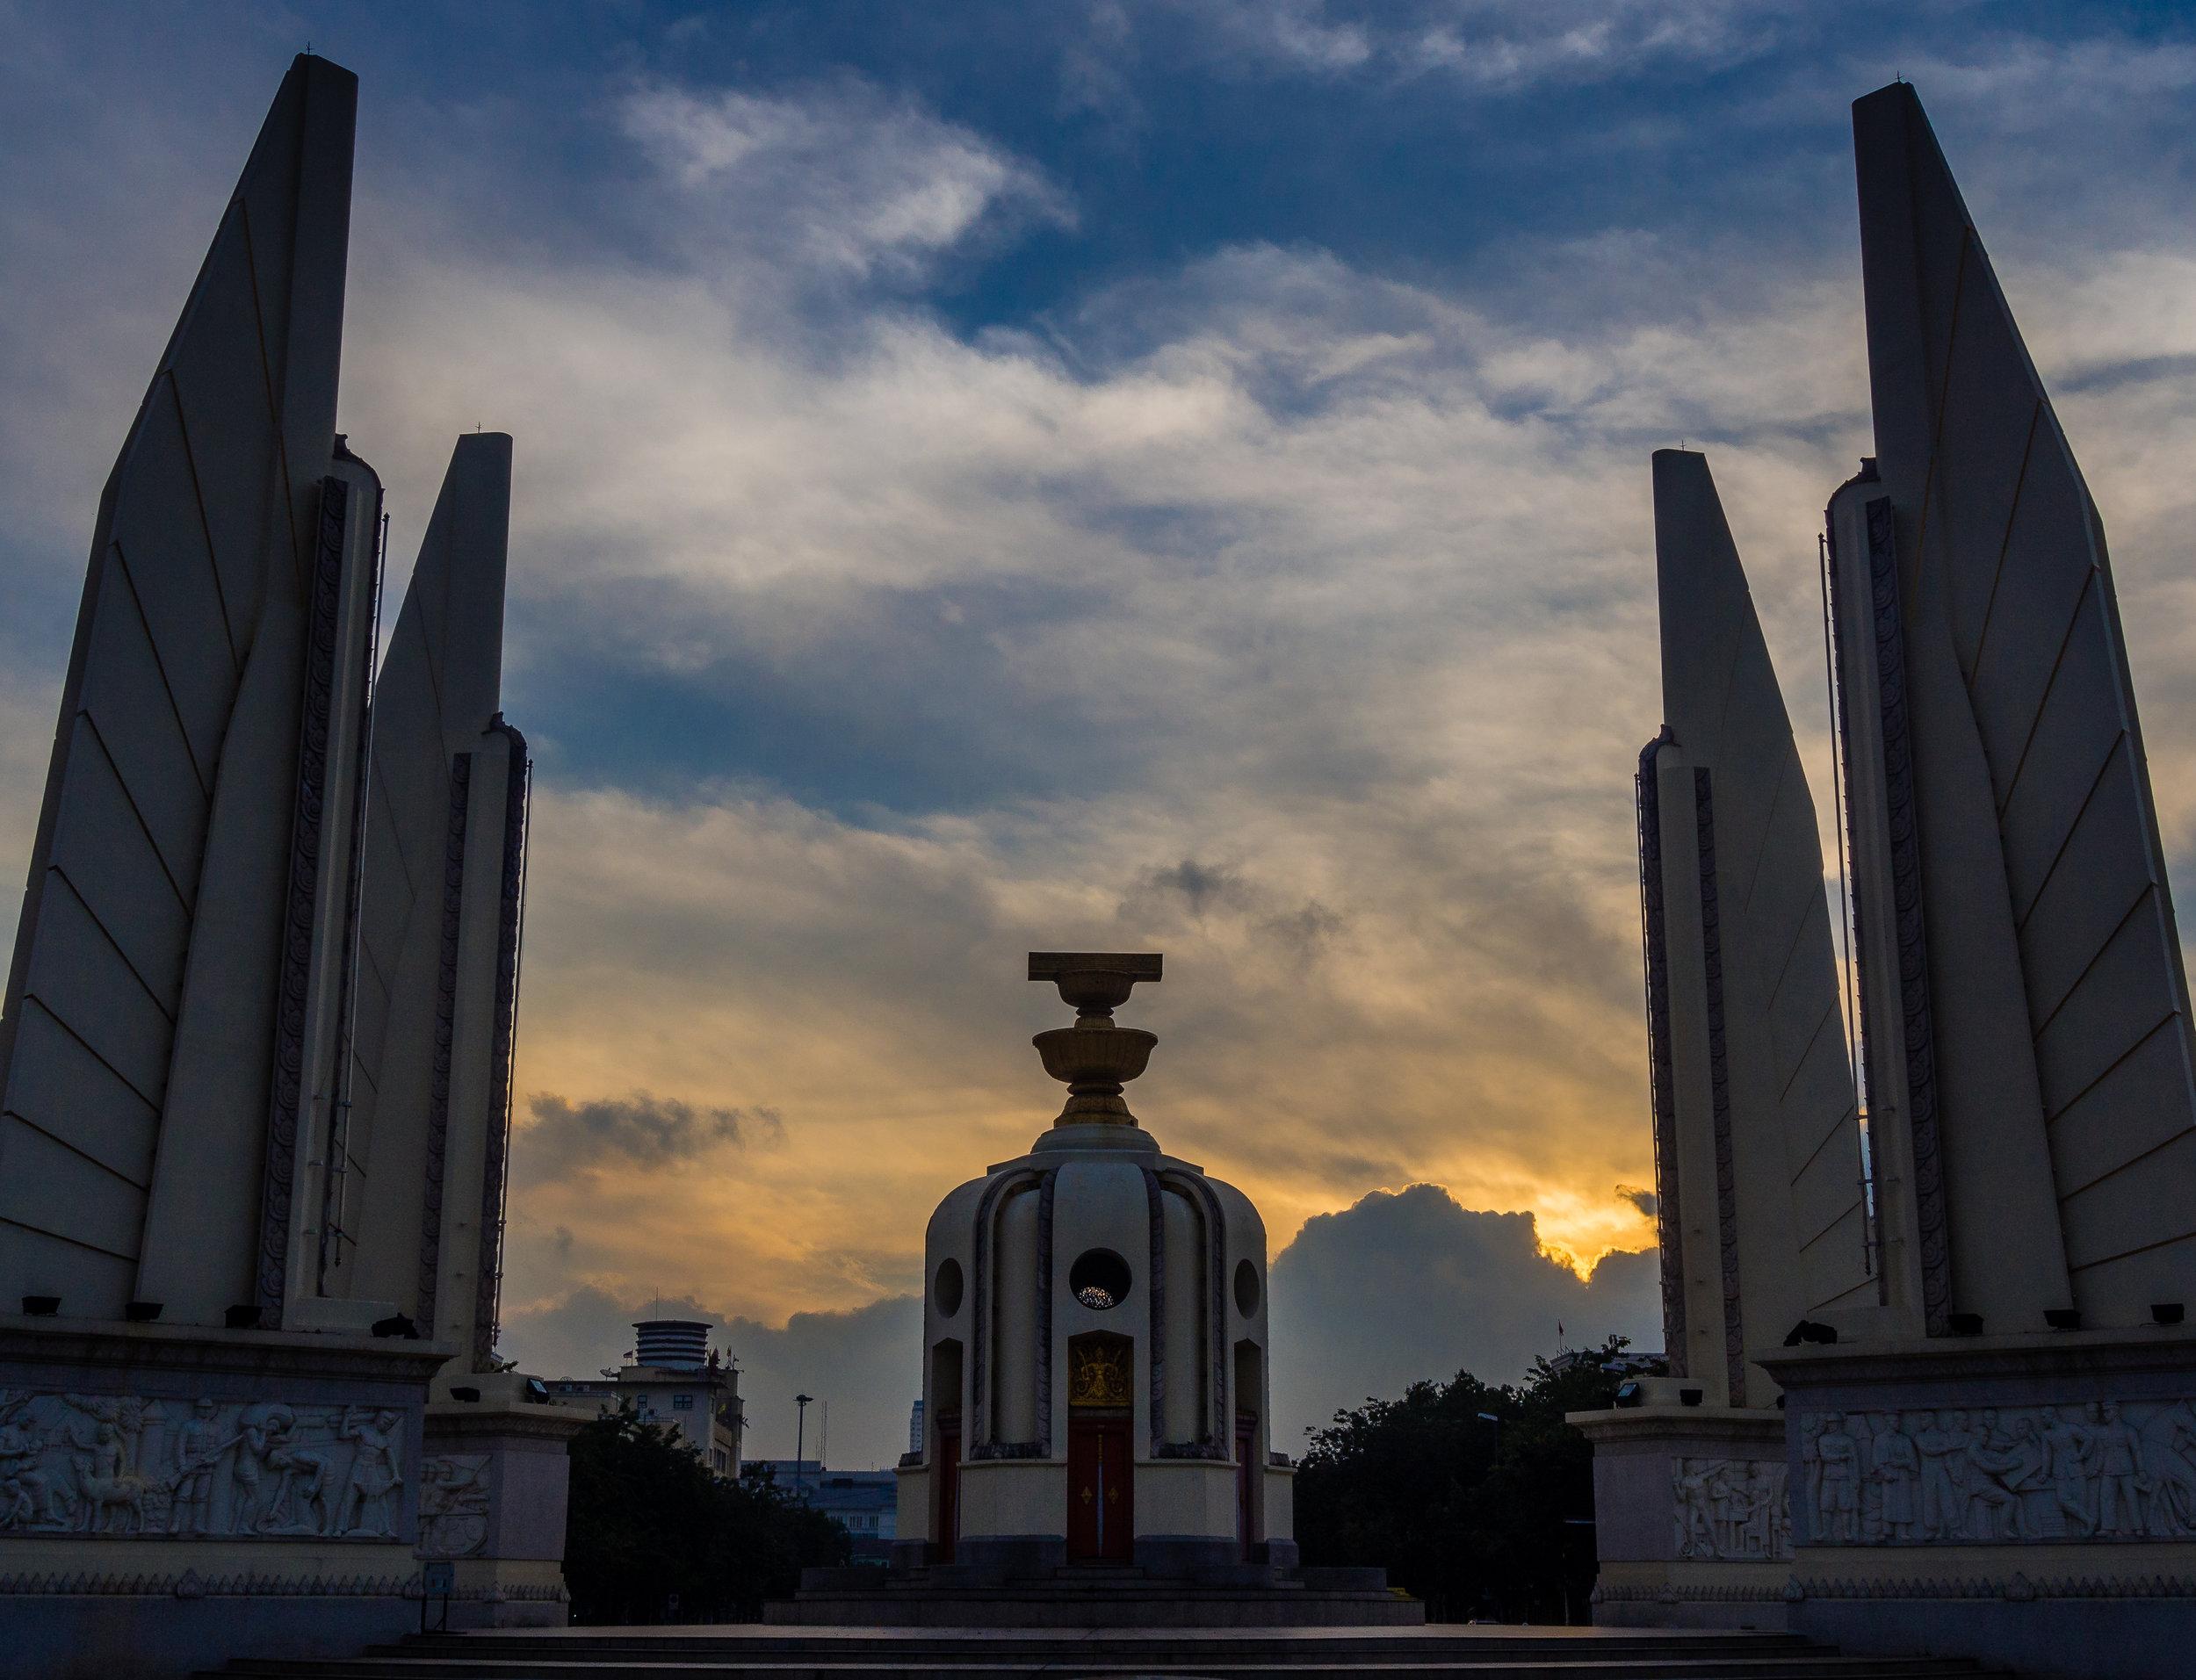 Sunrise at the Democracy Monument. Bangkok has its moments.